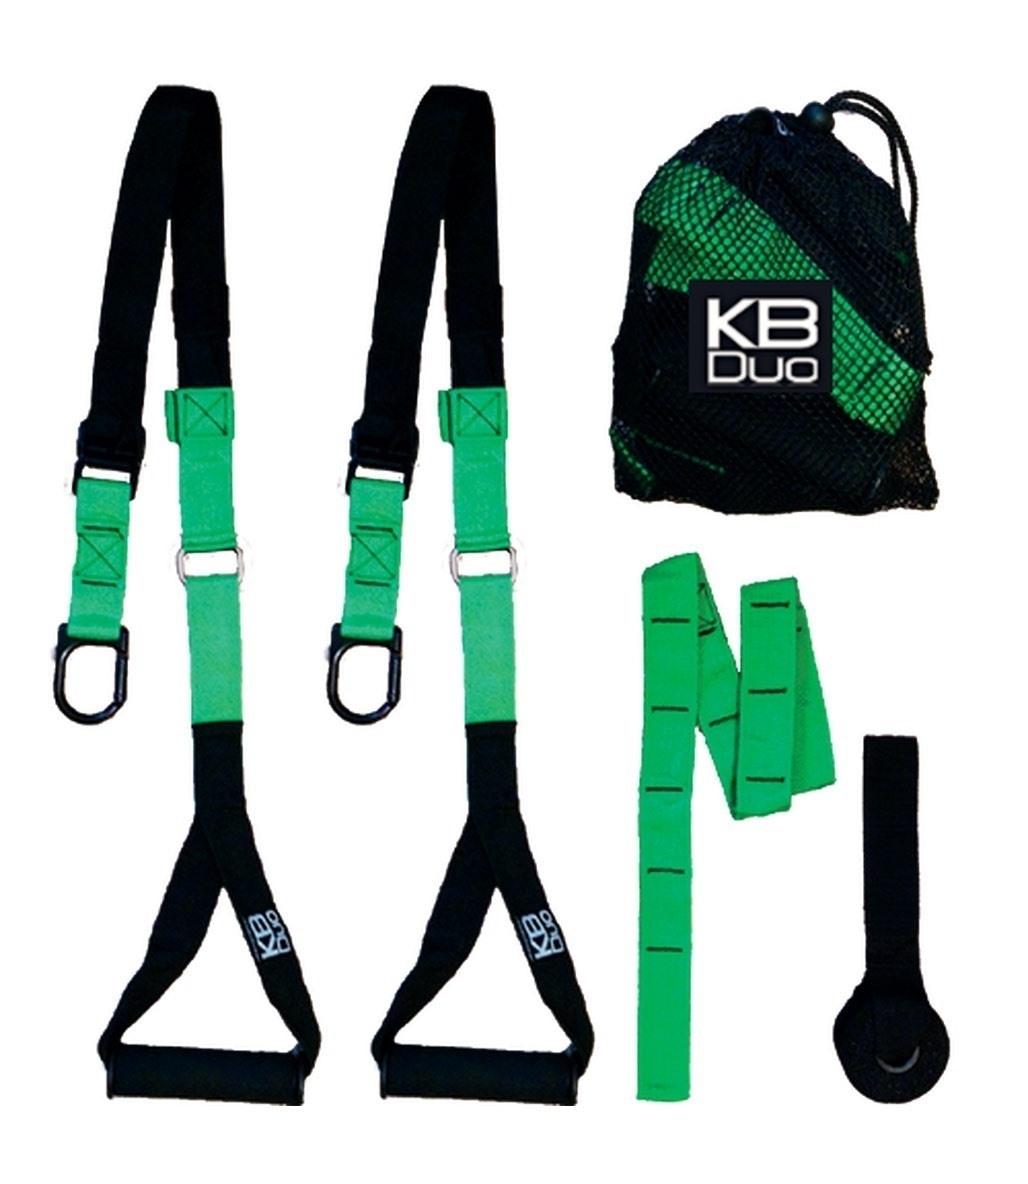 Kbands Duo Suspension Training Evde Spor Seti